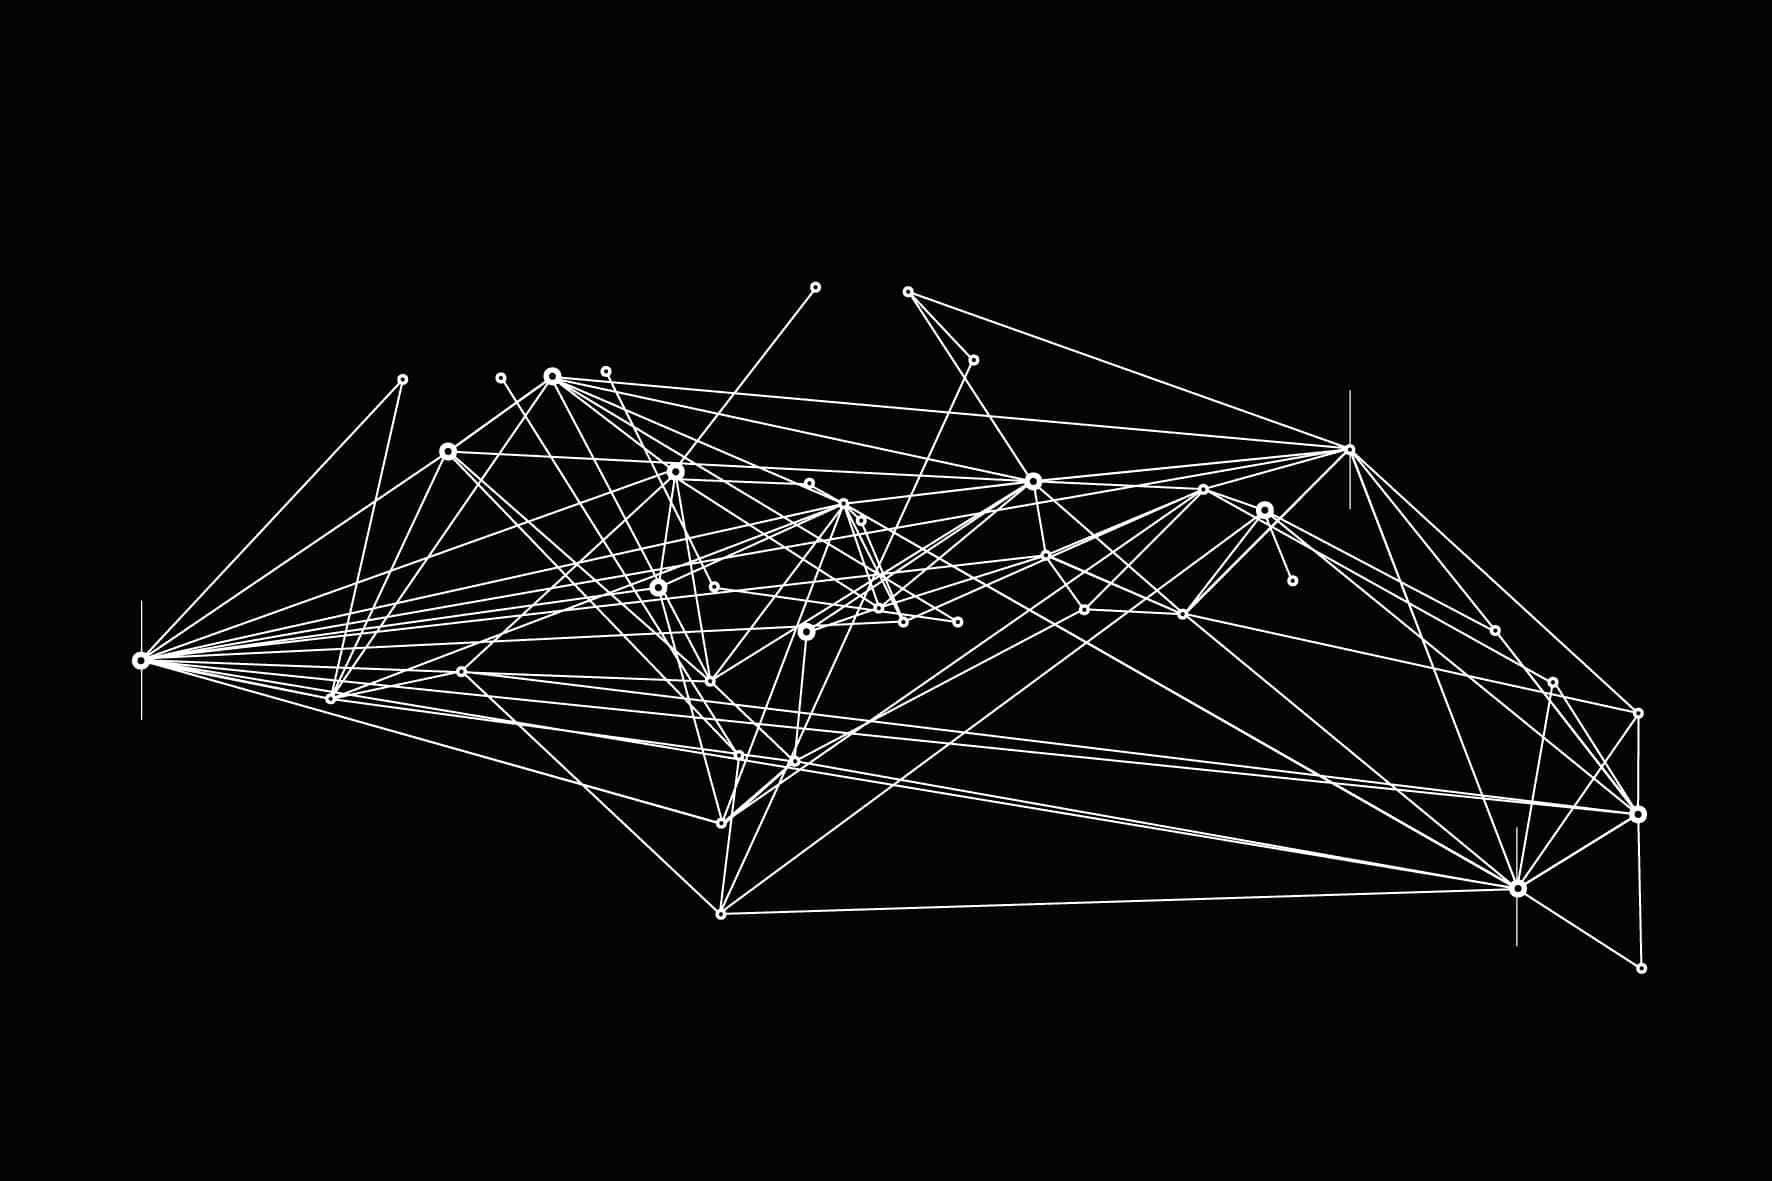 Franck Pourcel, Ulysse ou les constellations